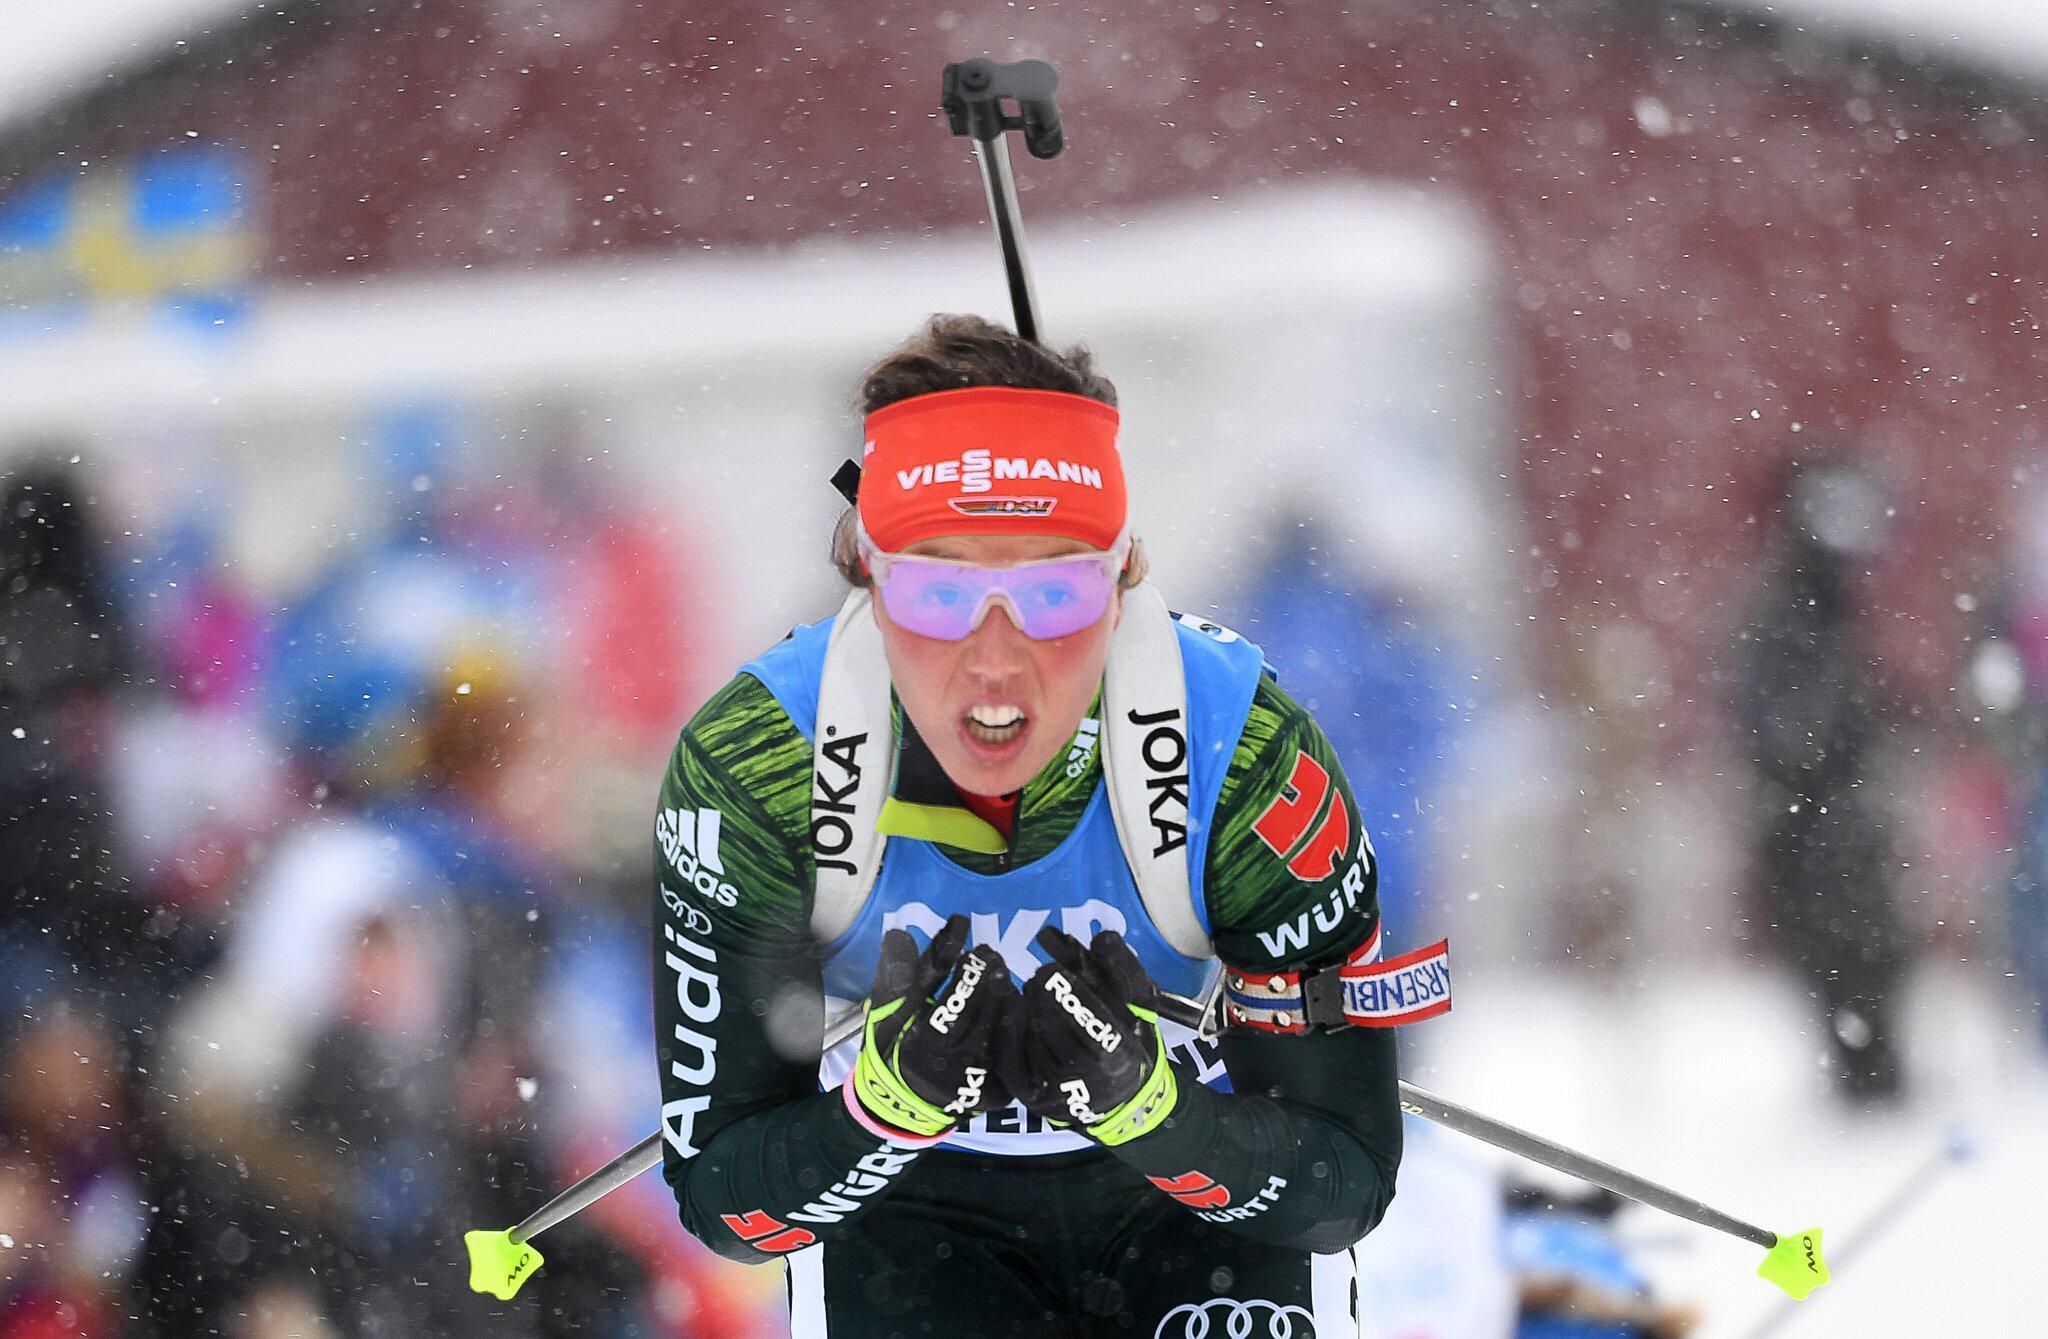 Bild zu Laura Dahlmeier, Biathlon, Östersund, Weltmeisterschaft, Verfolgung